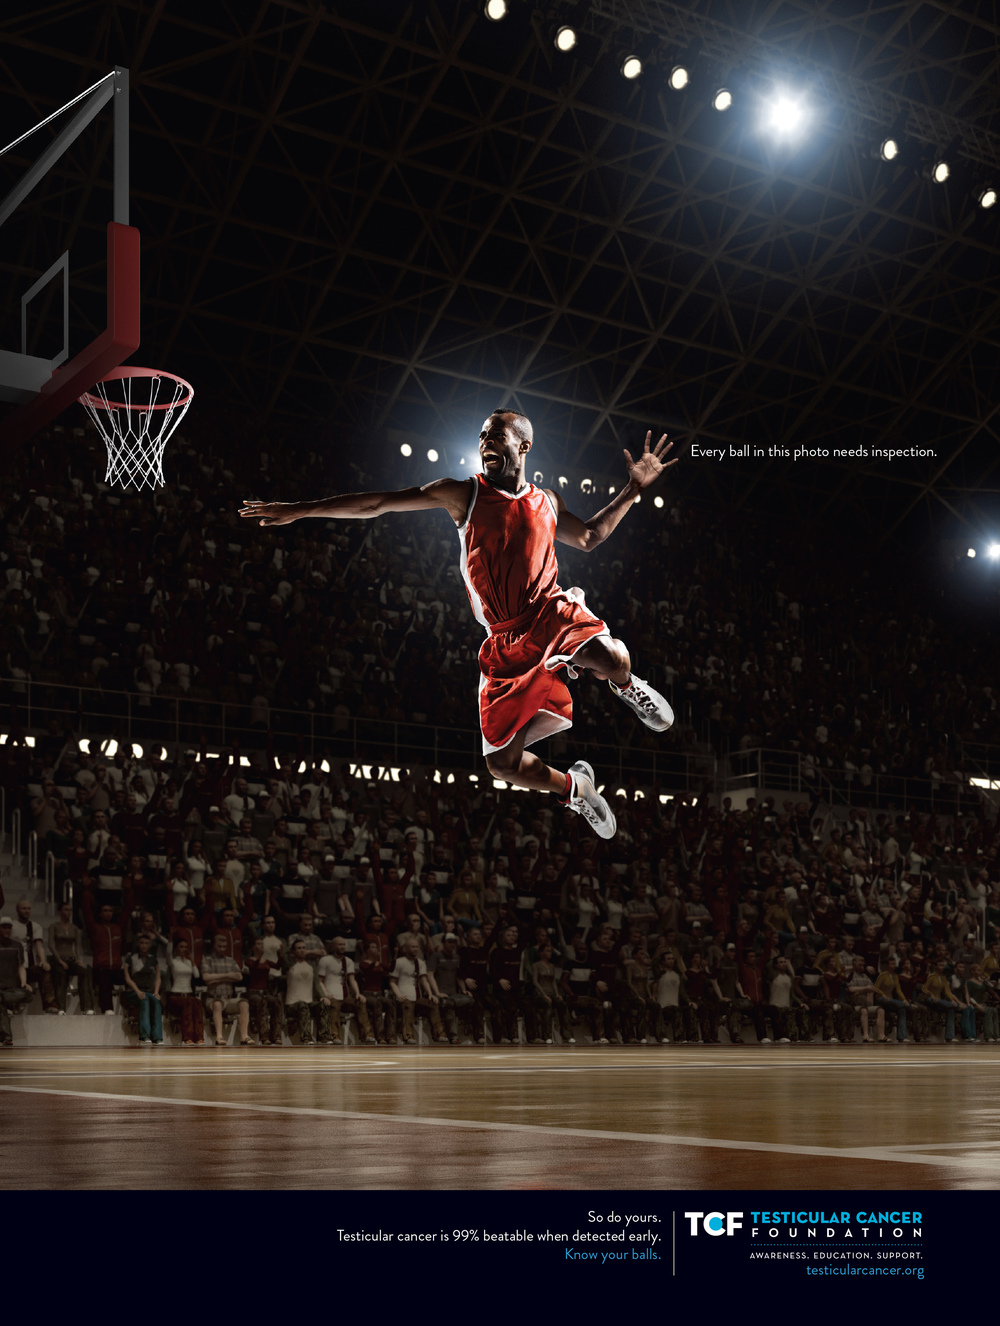 tcf_print_basketball_2.jpg